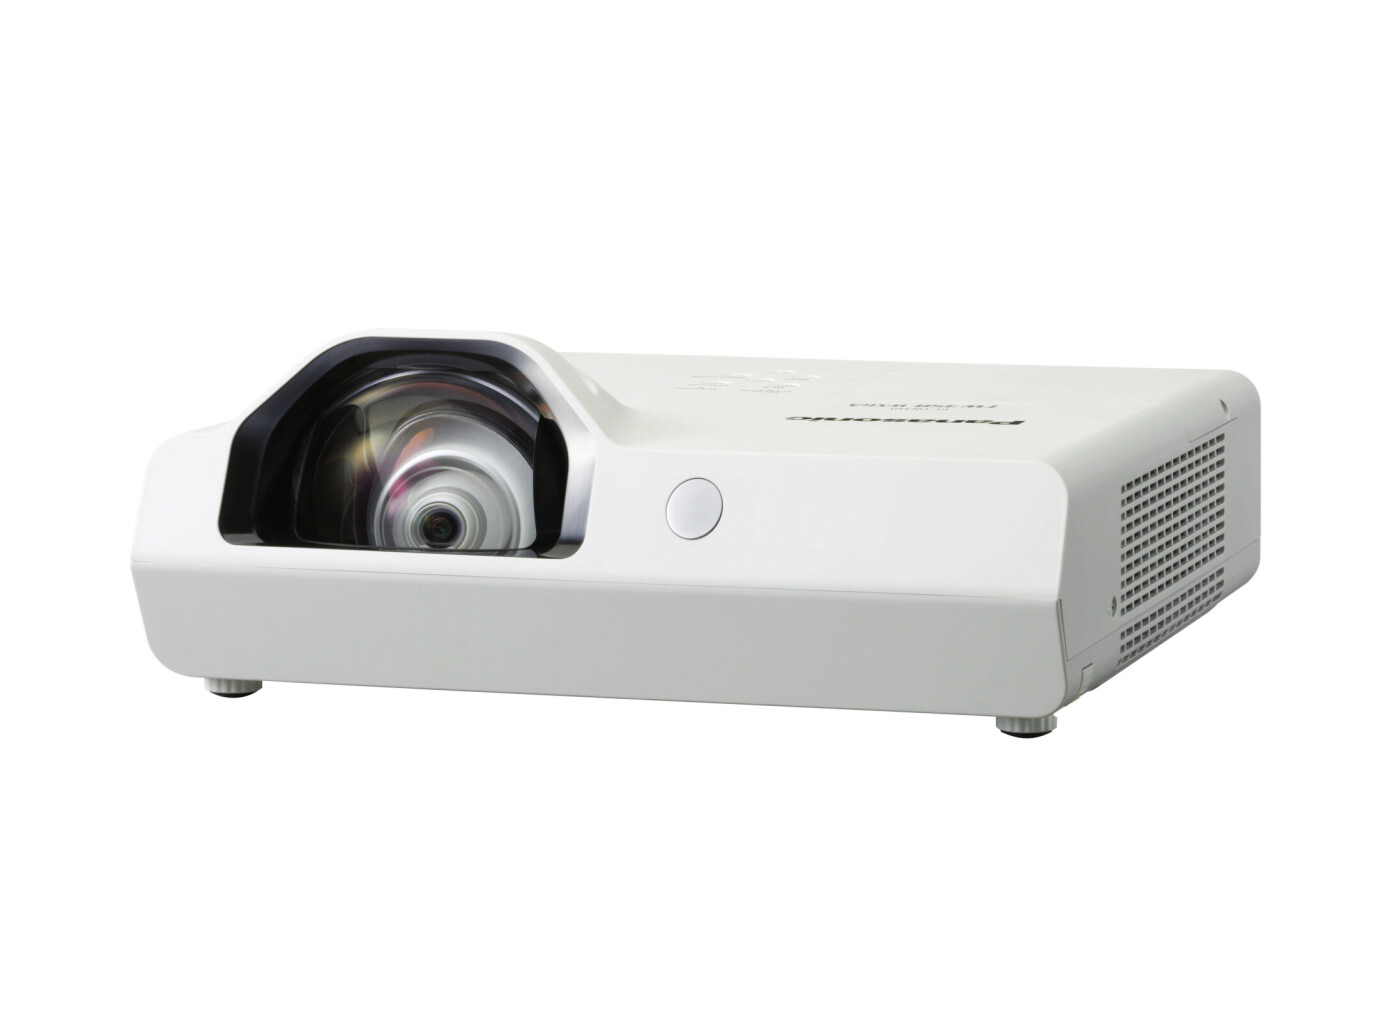 Panasonic PT-TX410 Kurzdistanzbeamer mit 3800 ANSI-Lumen und XGA